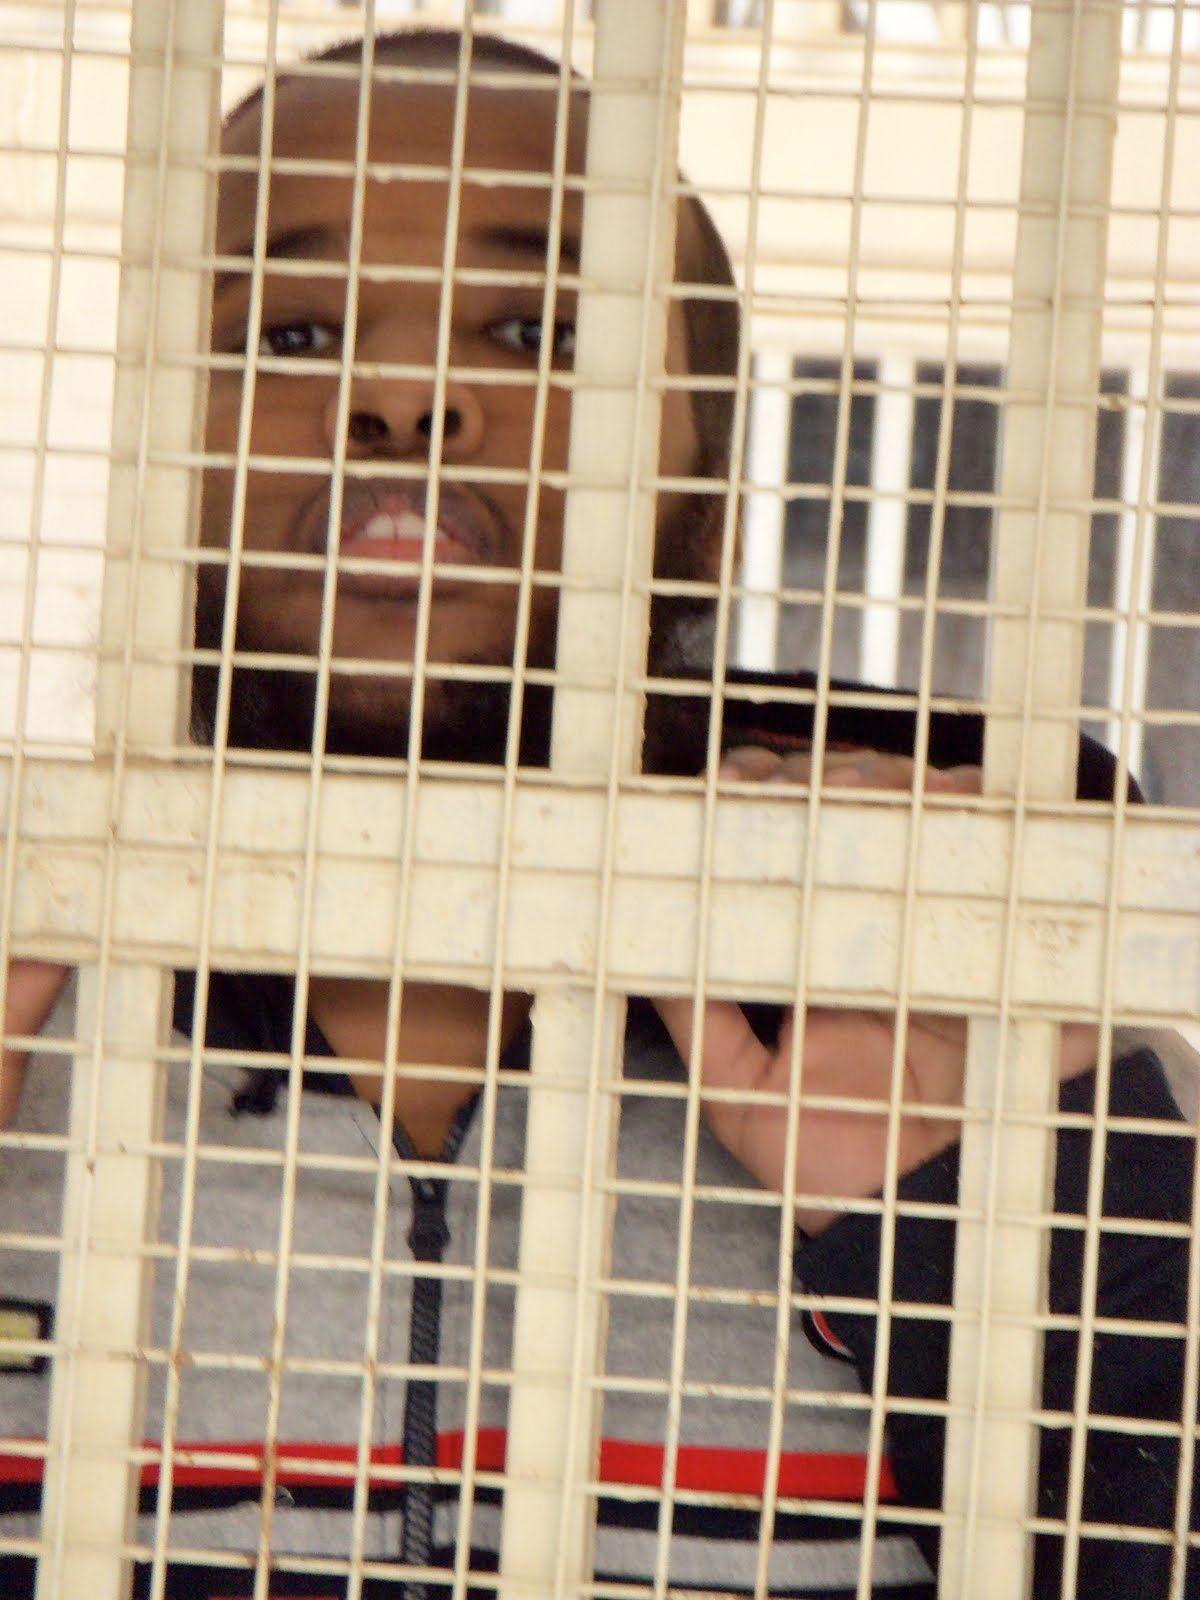 <a href='http://2.bp.blogspot.com/_MnYI3_FRbbQ/TS7Dxjv3JKI/AAAAAAAAC38/Xb1VFZQKyas/s1600/101_0029%2Bcopy.JPG'>This photograph of Gulet Mohamed in detention</a> was taken by his brother.